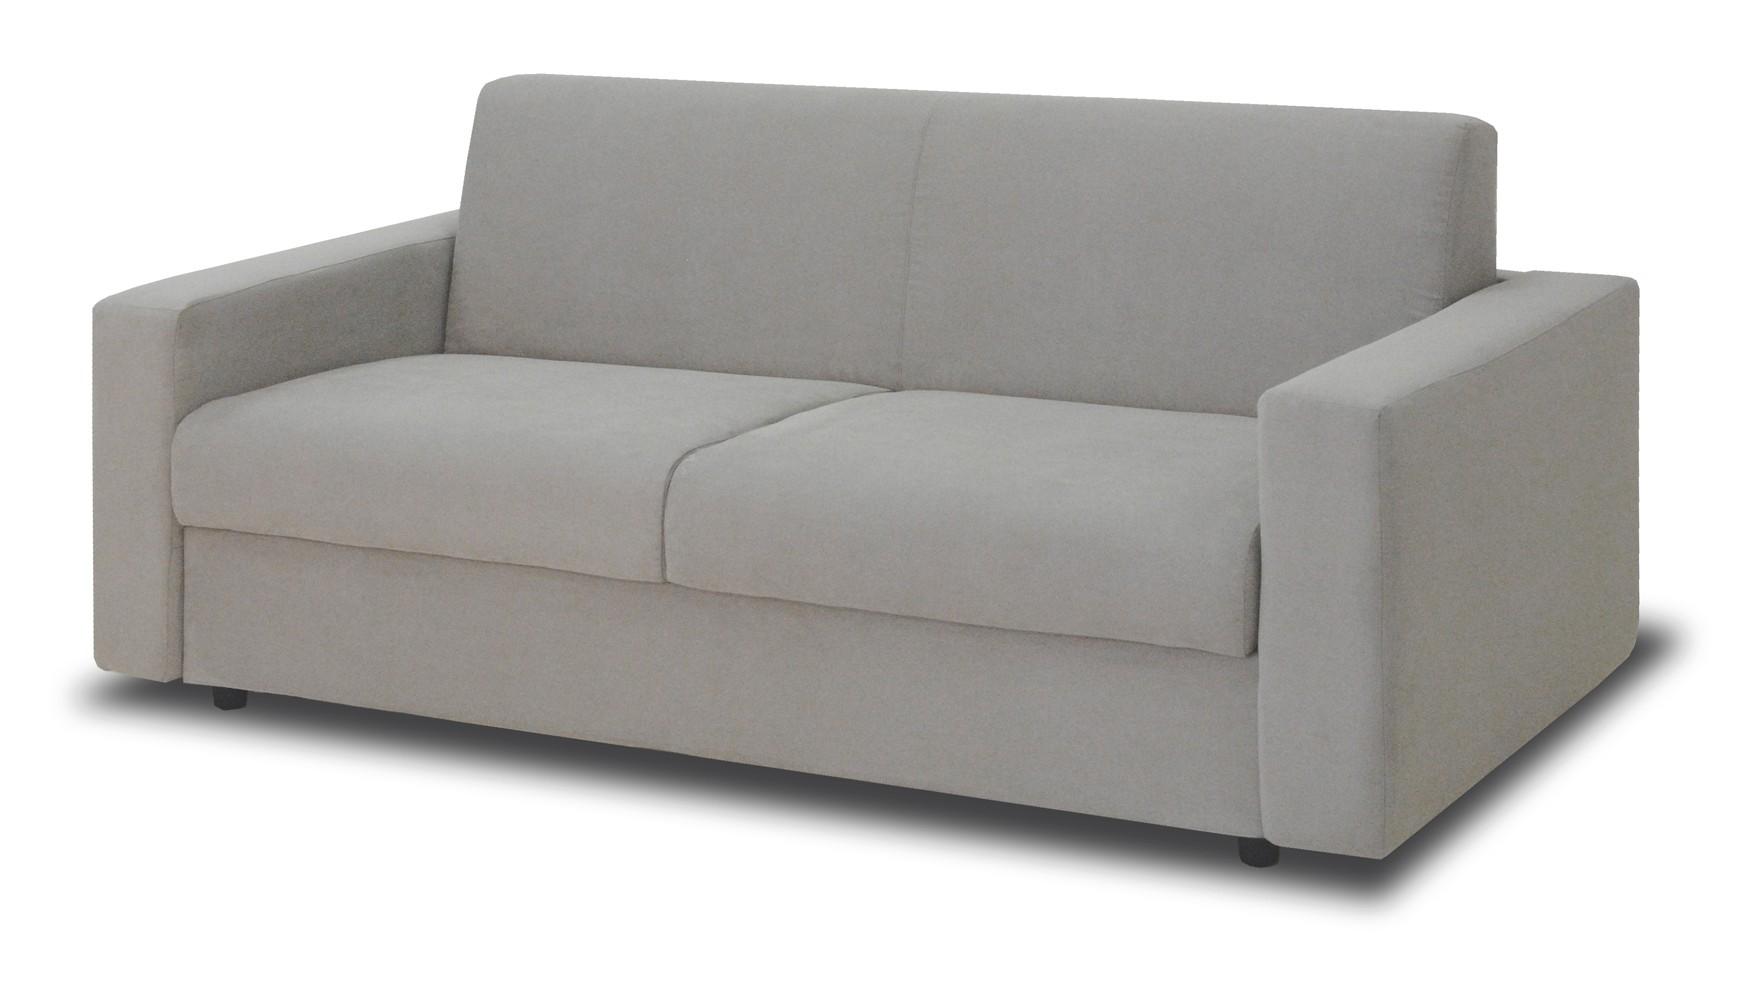 Canape Lit Ikea Suisse